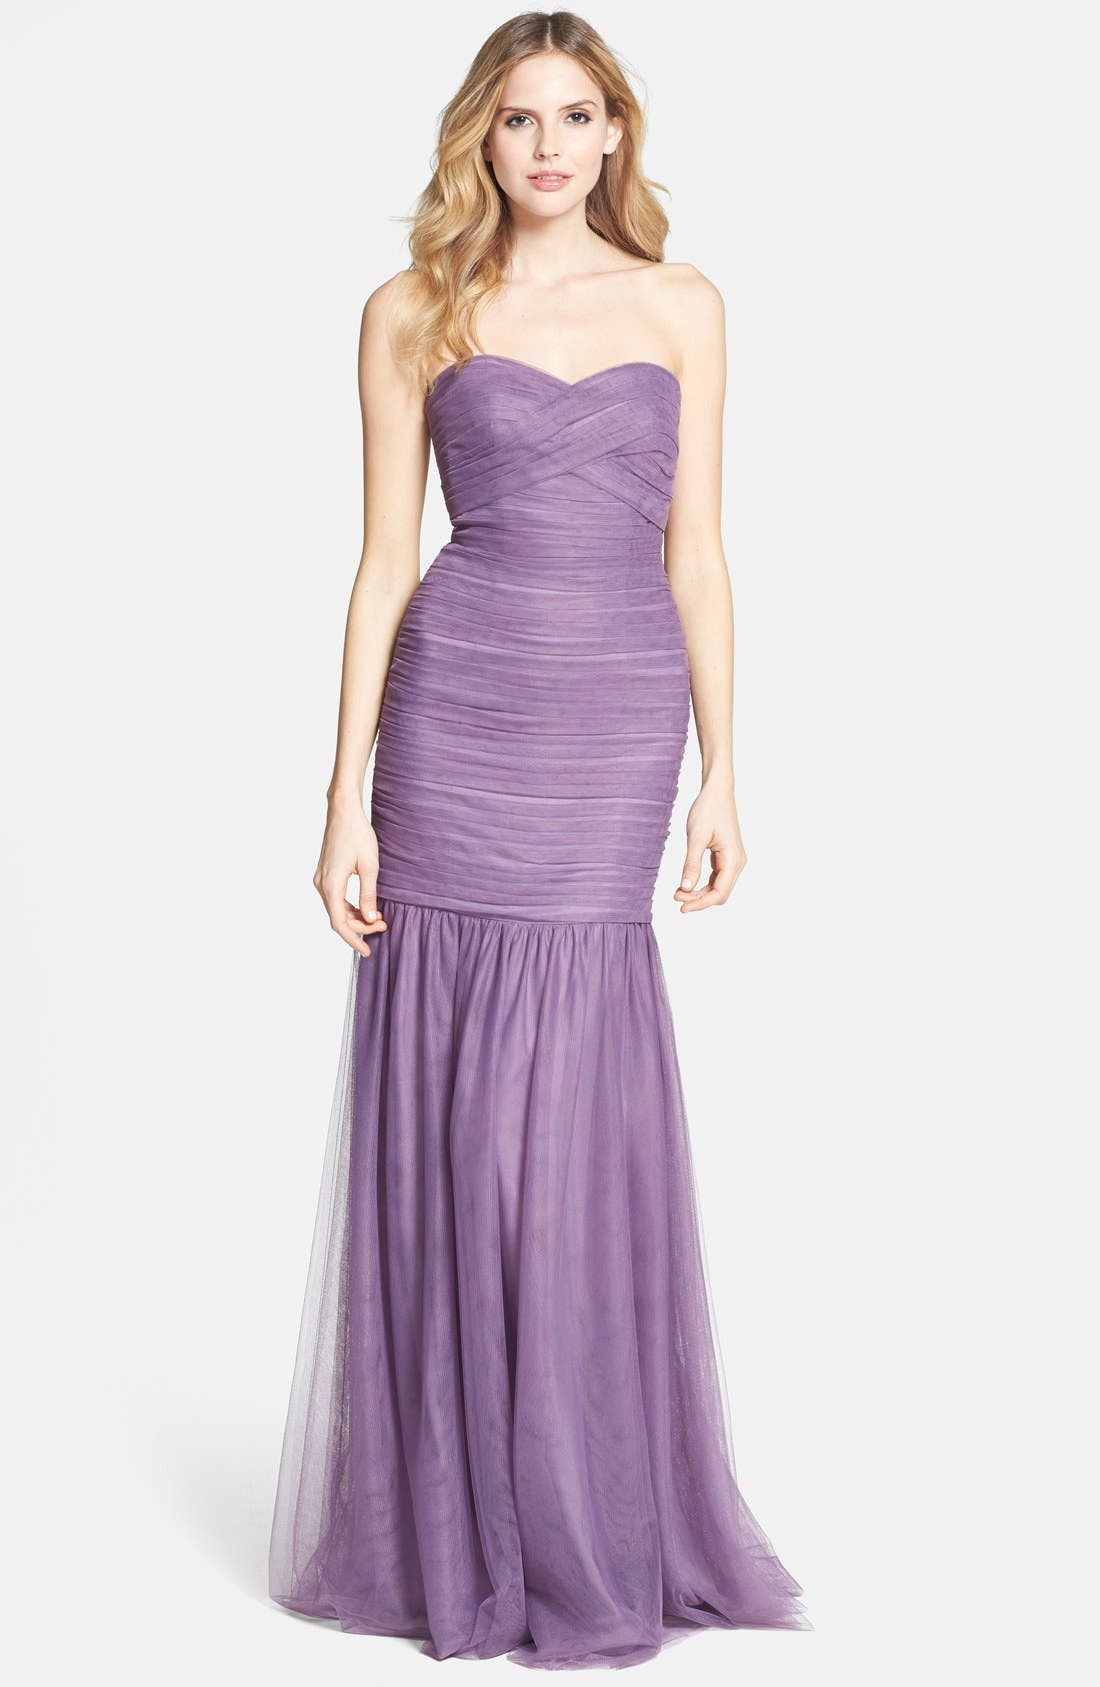 Main Image - Monique Lhuillier Bridesmaids Shirred Tulle Gown